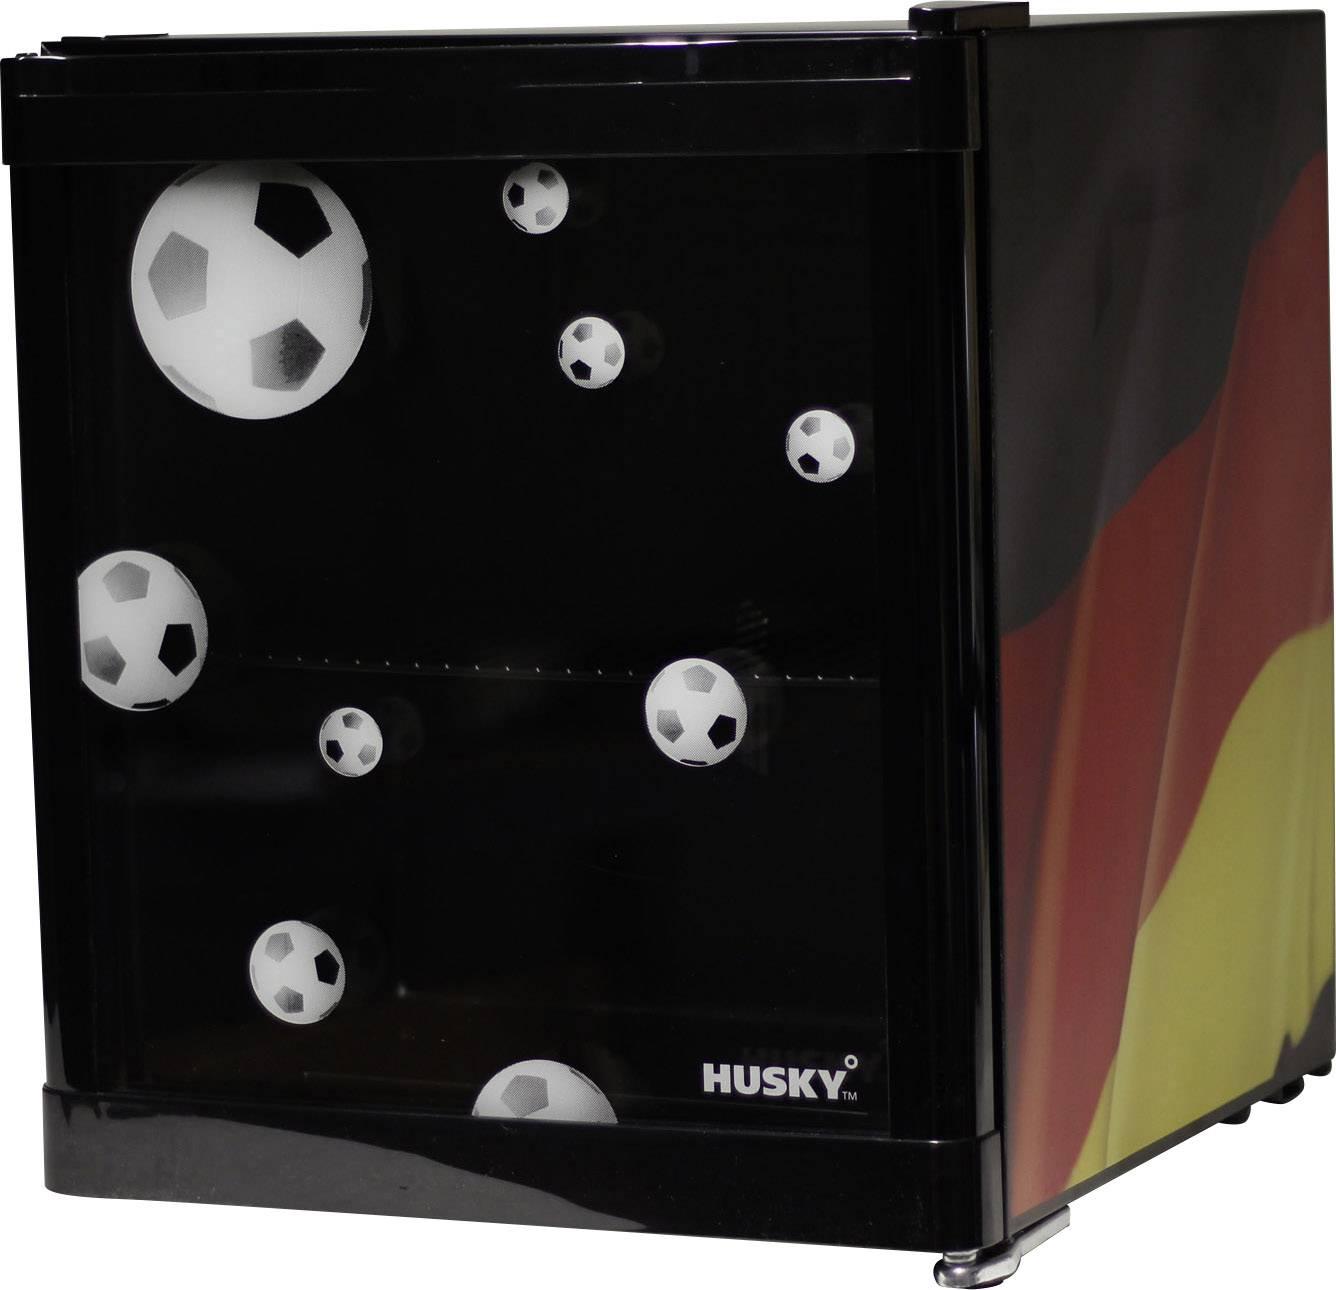 Husky Cool Cube. Husky Afri Cola Coolcube Anzahl Gebraucht ...